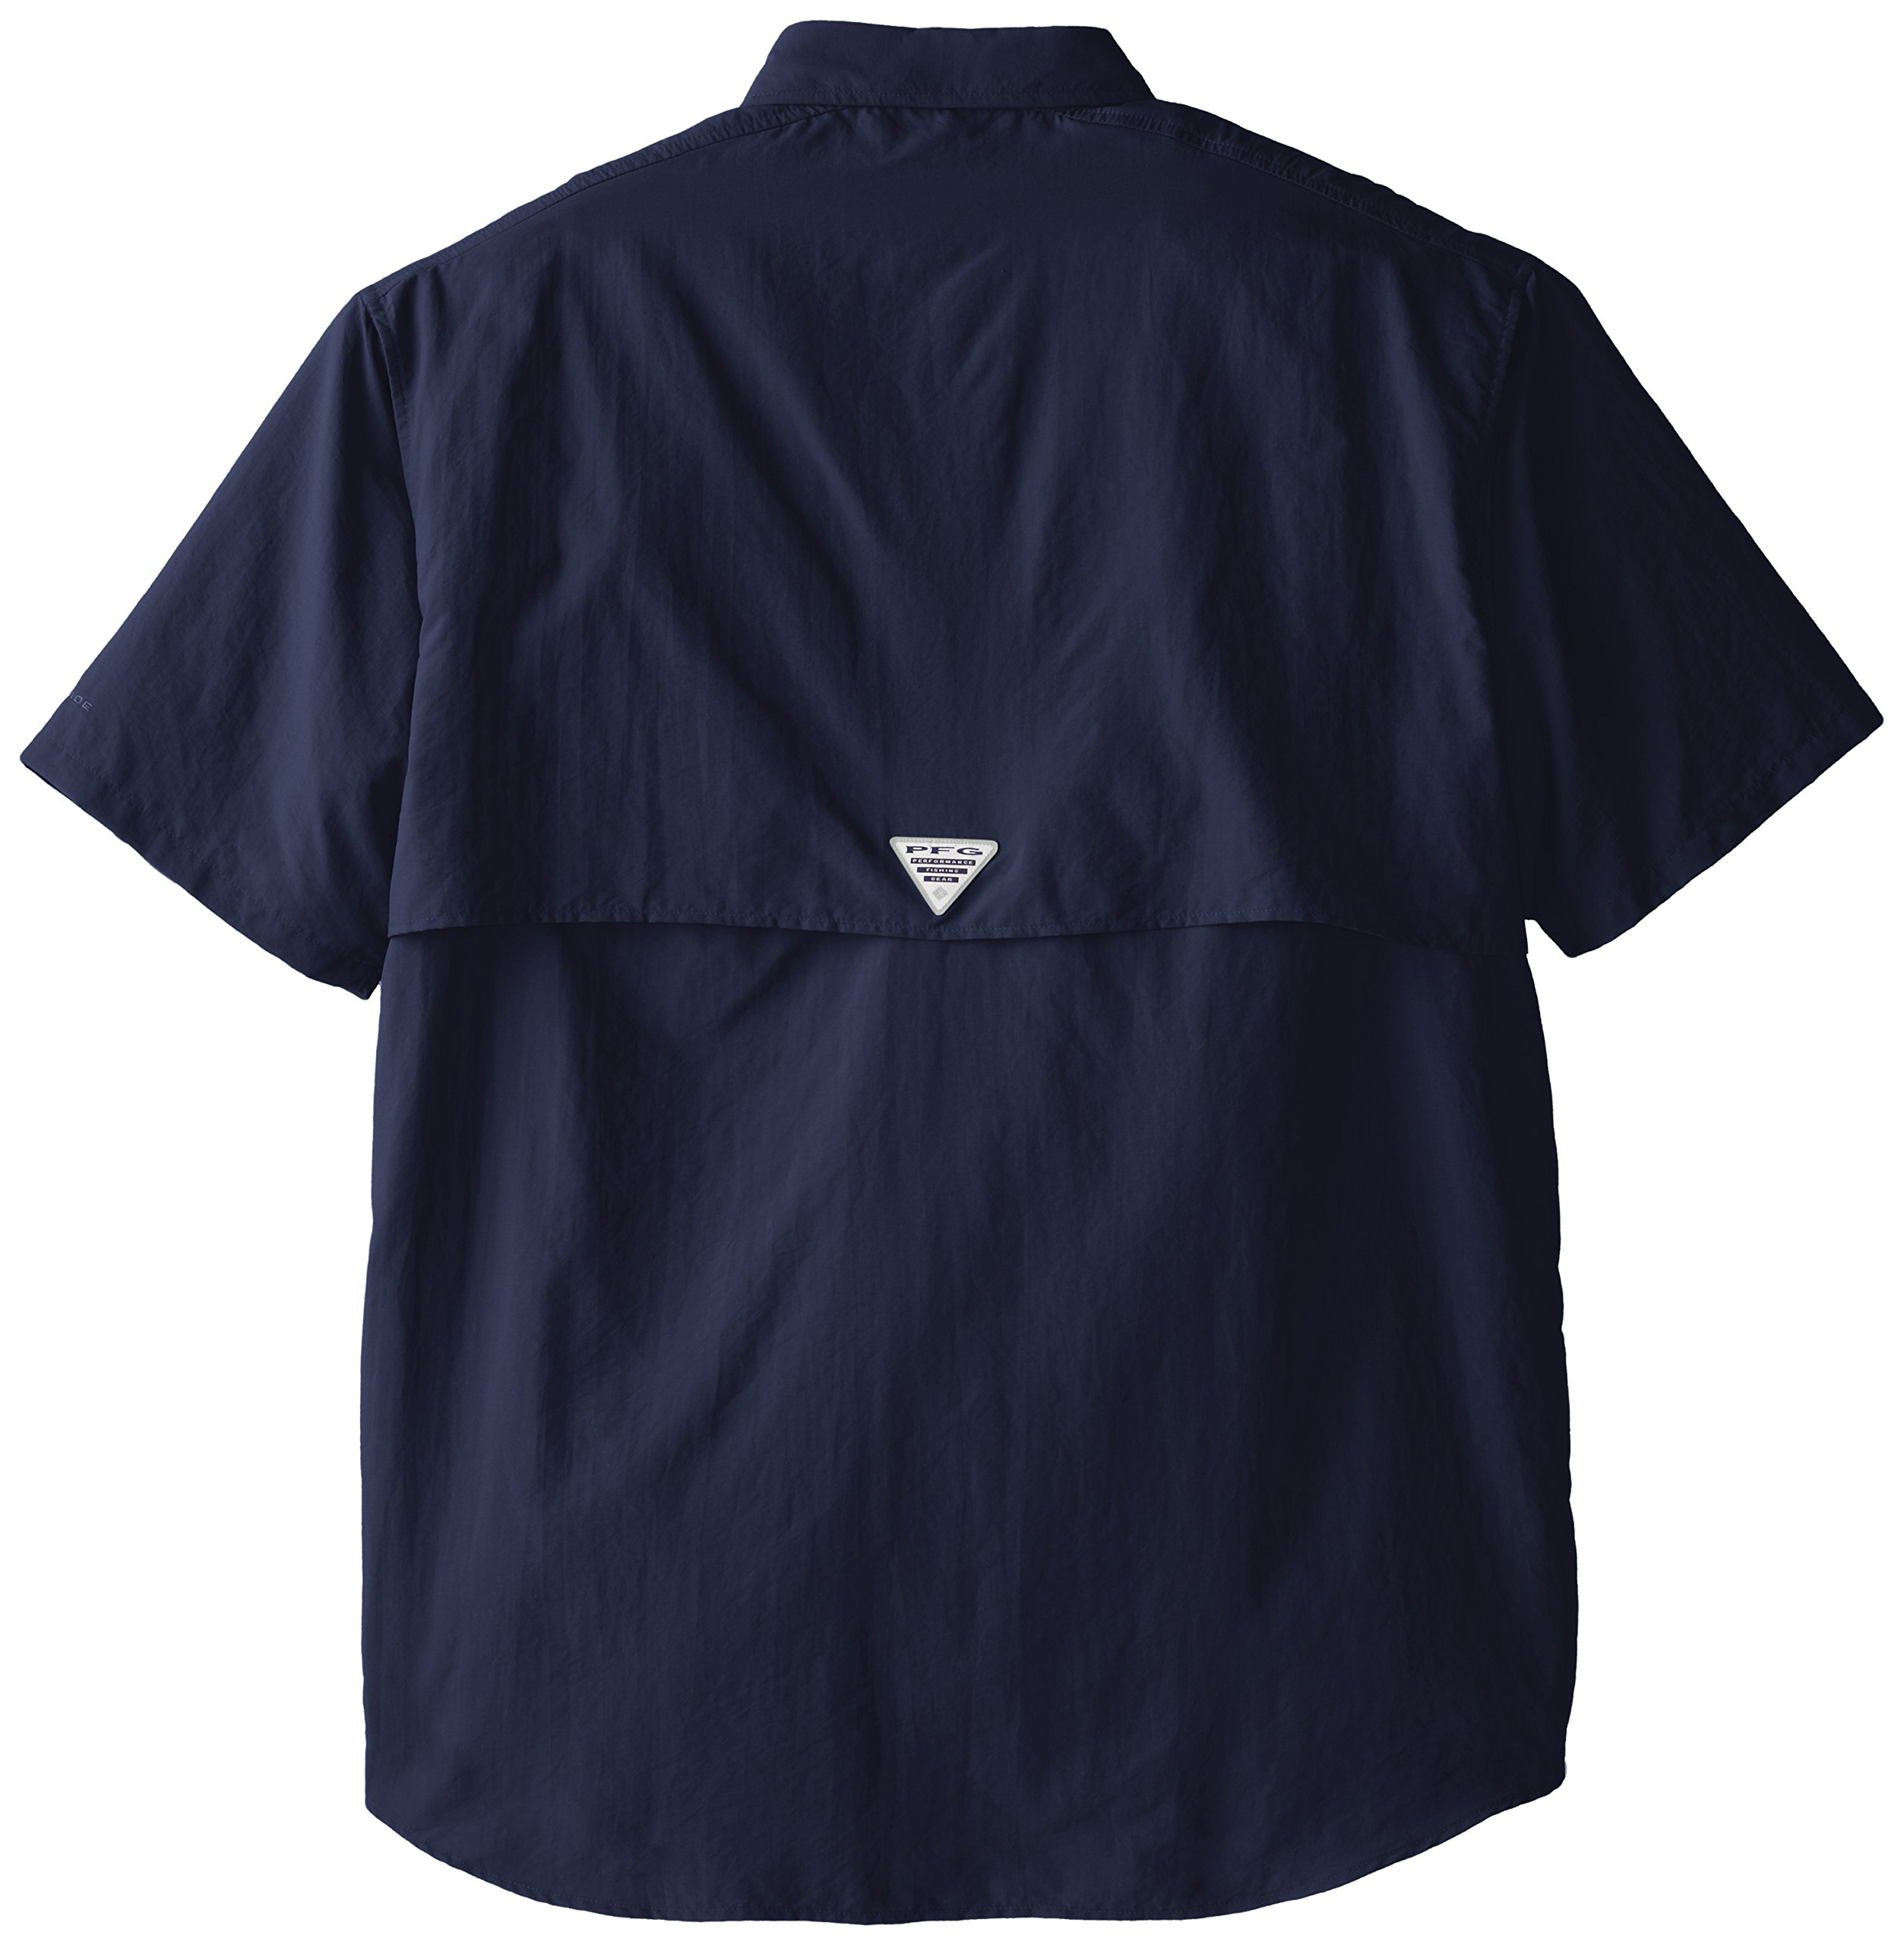 Columbia-Men-039-s-PFG-Bahama-II-Short-Sleeve-Shirt-T-Choose-SZ-color thumbnail 15